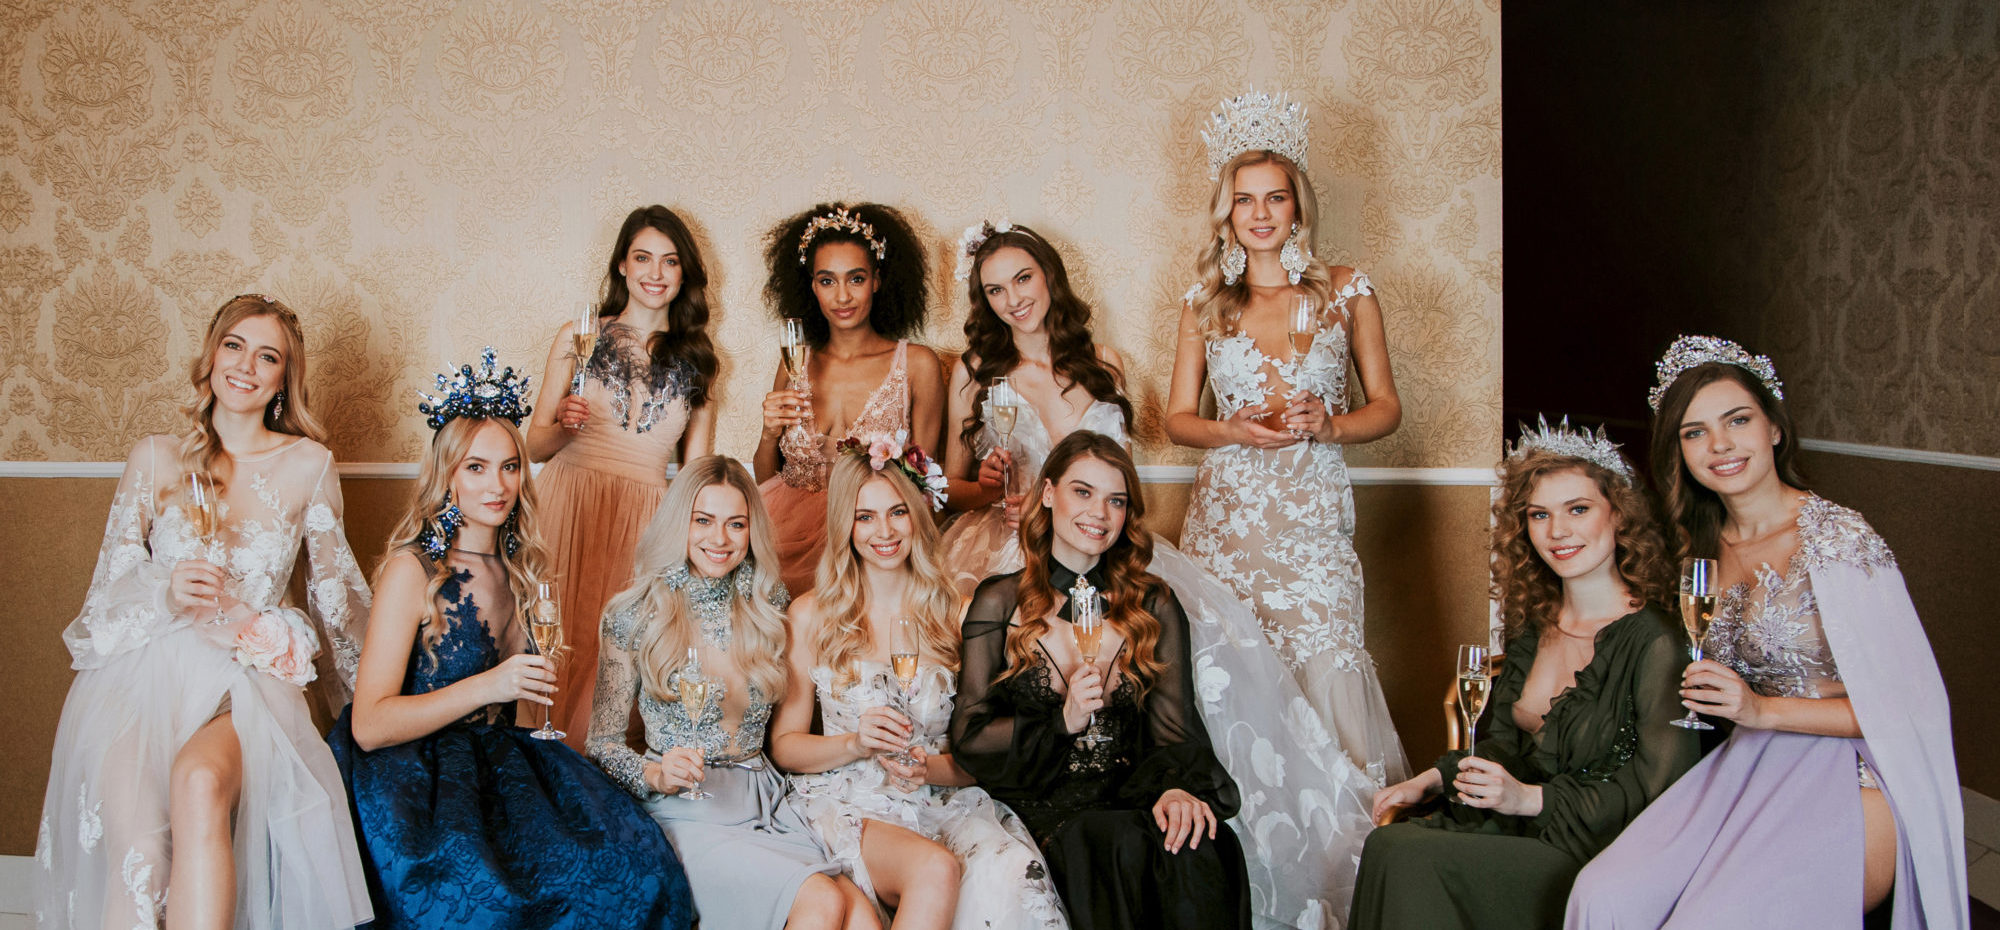 Finalistky MISS SLOVENSKO 2018 sizasúťažili pred finále unás vHuberte